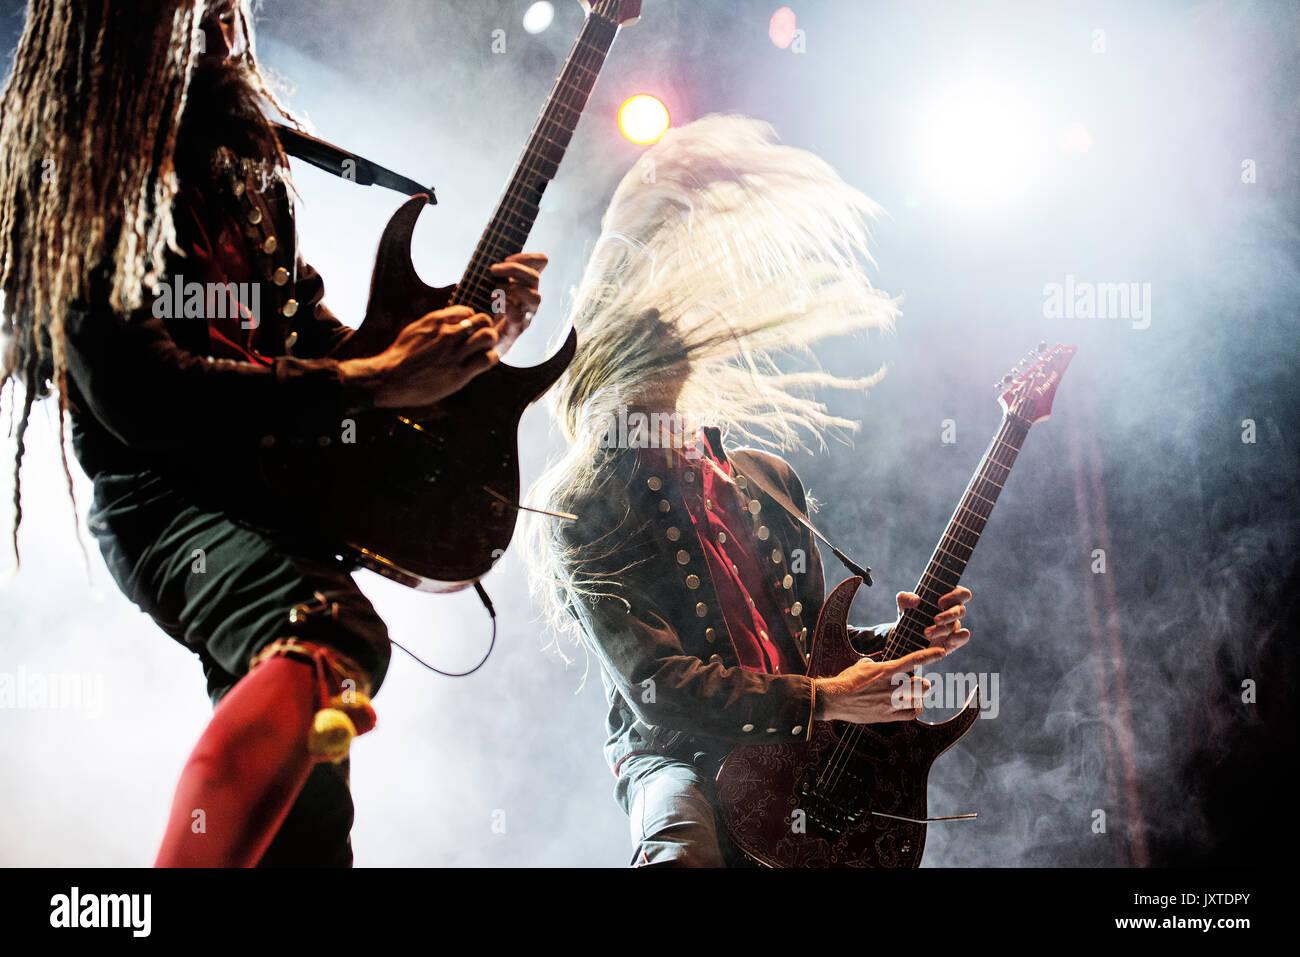 Juni: Avatar (Musik Band) im Konzert an Download (Heavy Metal Musik  Festival) am 24. Juni 2017 in Madrid, Spanien.